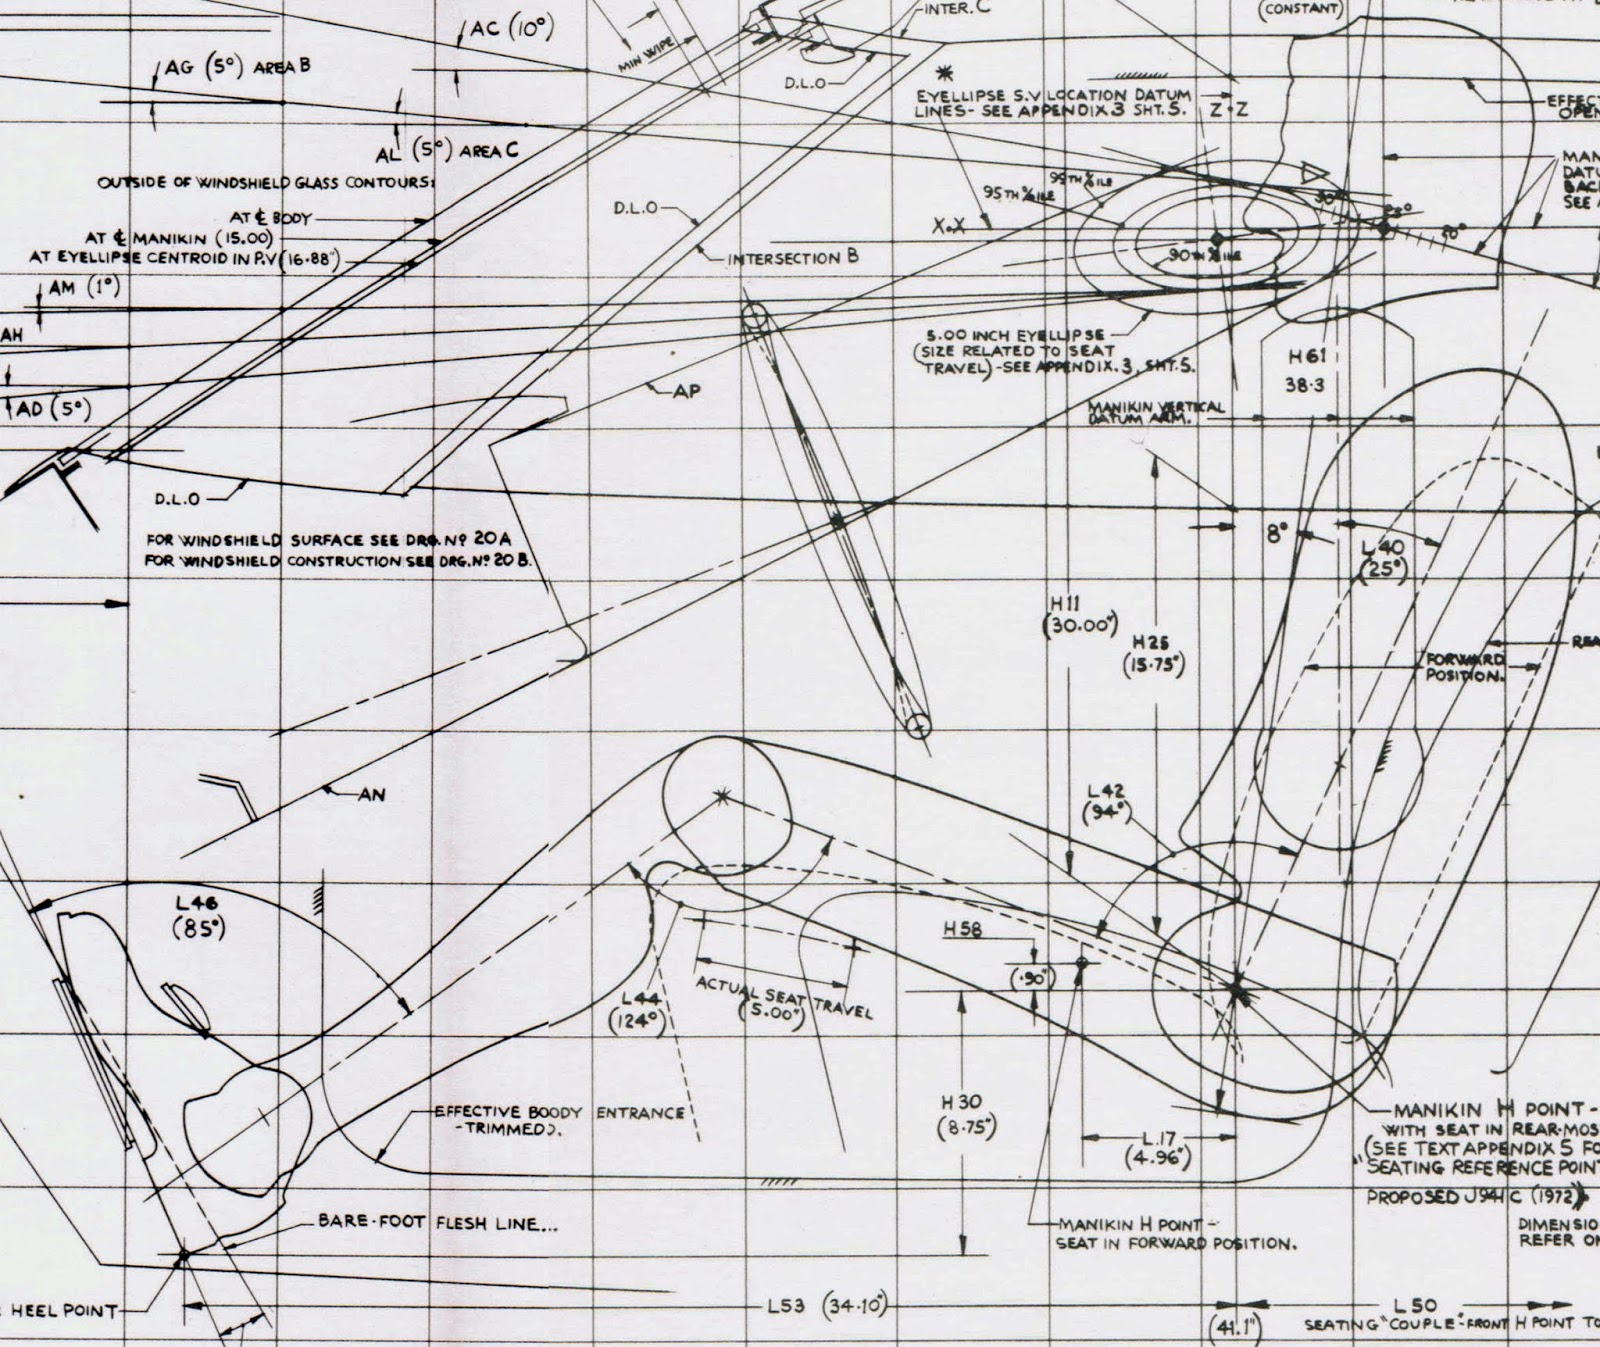 1998 Ford Windstar Serpentine Belt Diagram